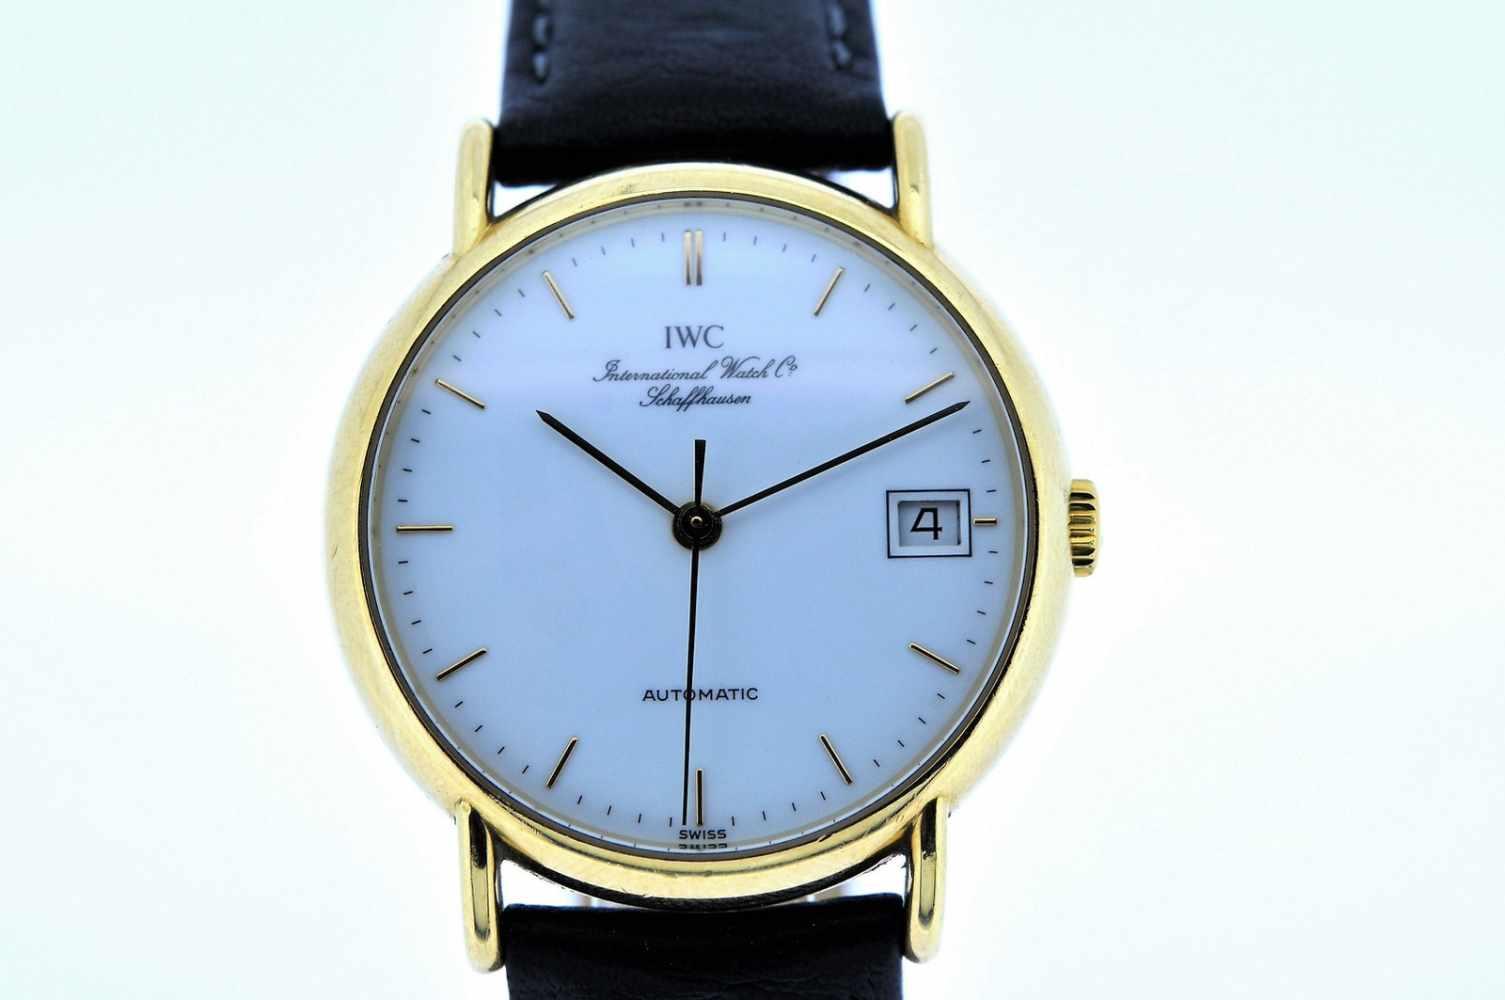 IWC Goldene 18karätige Armbanduhr an Lederband, IWC, Automatik, zentrale Sekunde, Ankerwerk, - Bild 4 aus 4